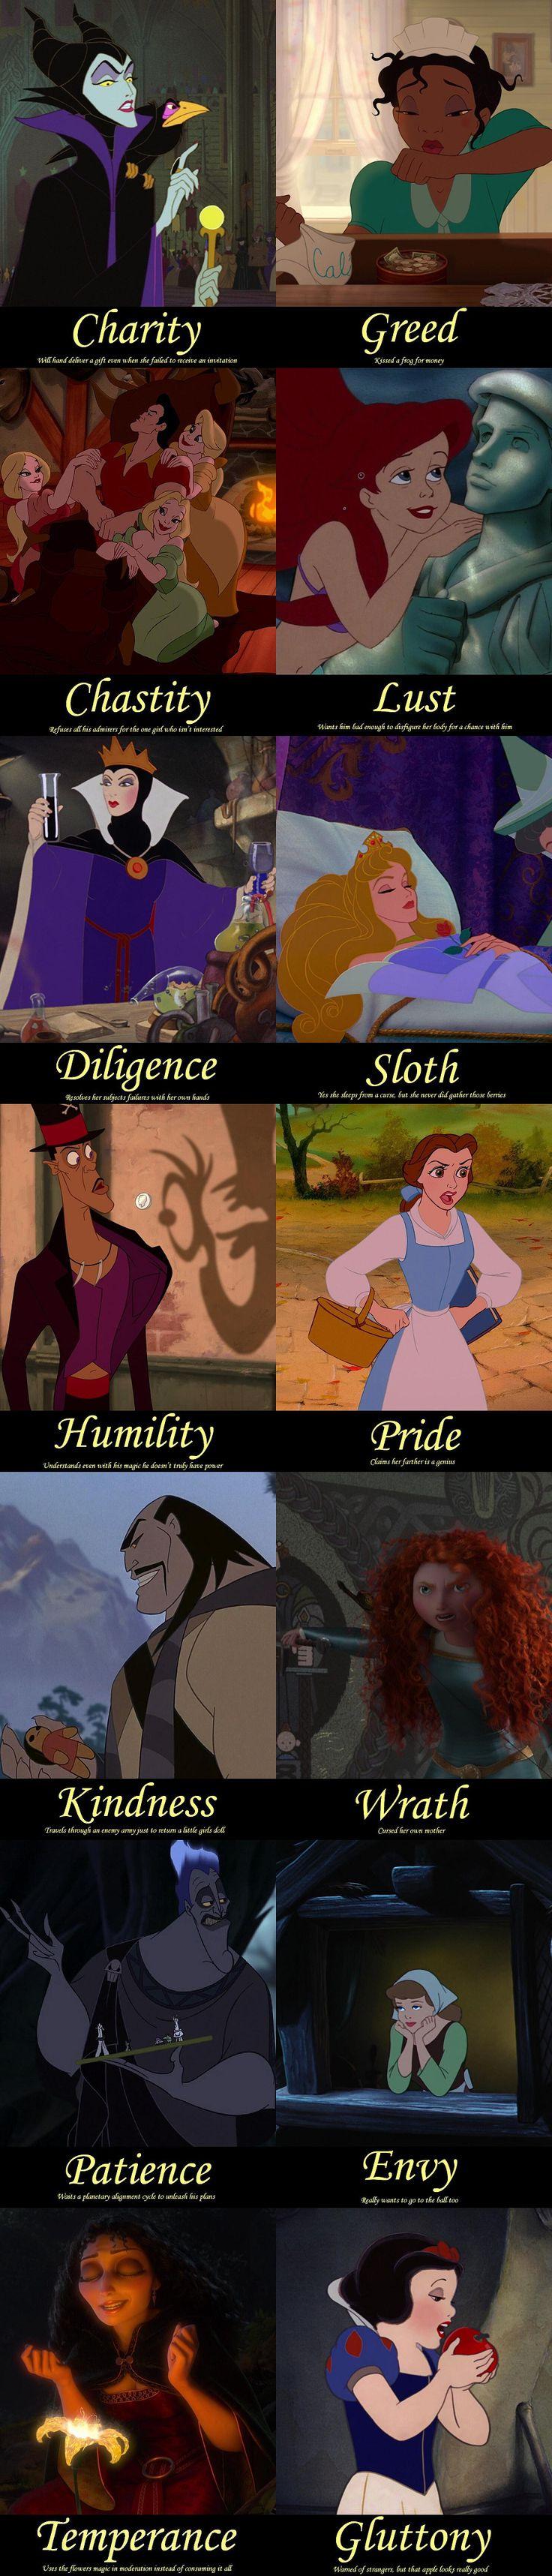 oooh, interesting. | Disney Villain Virtues and Princess Sins by stachan.deviantart.com on @deviantART